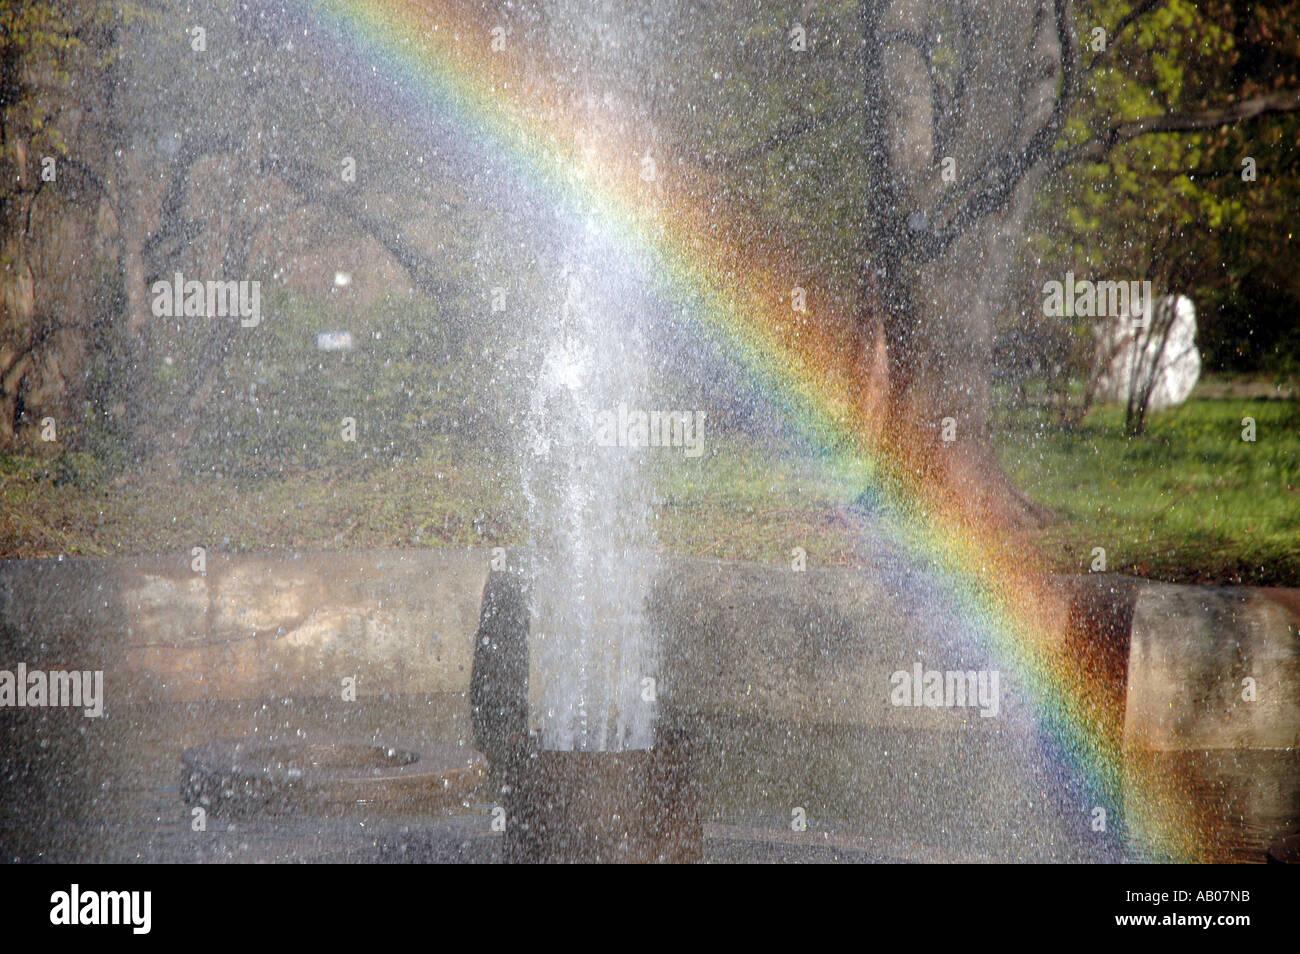 Rainbow from fountain - Stock Image